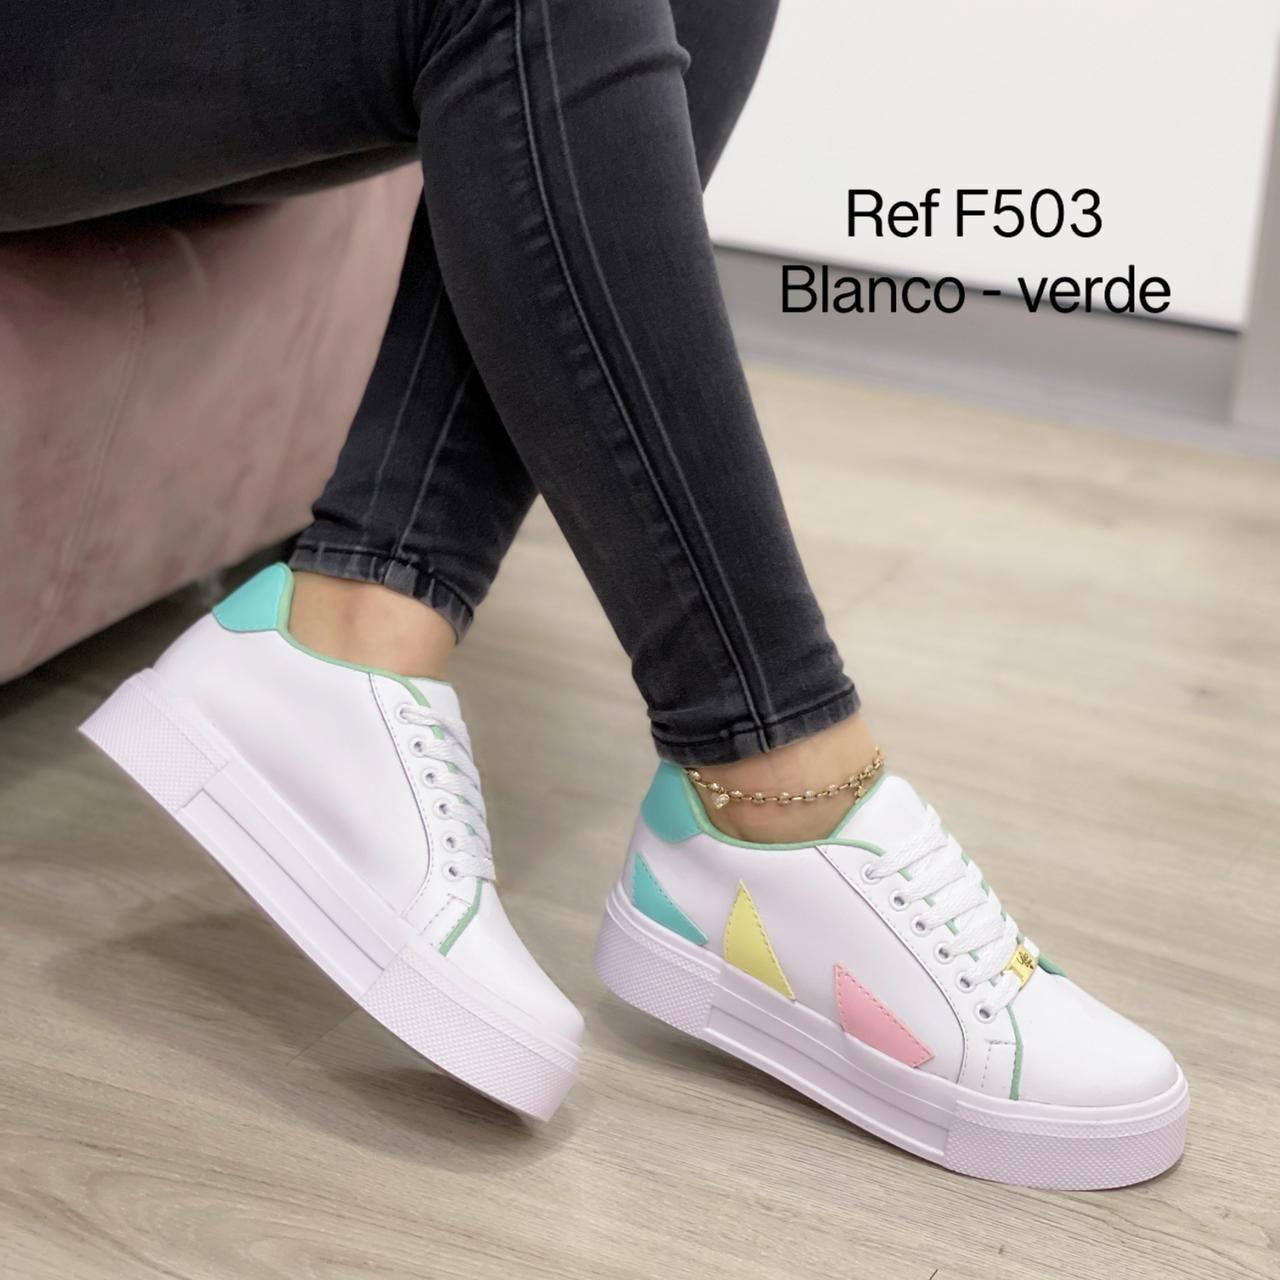 RefF-503 Blanco/verde